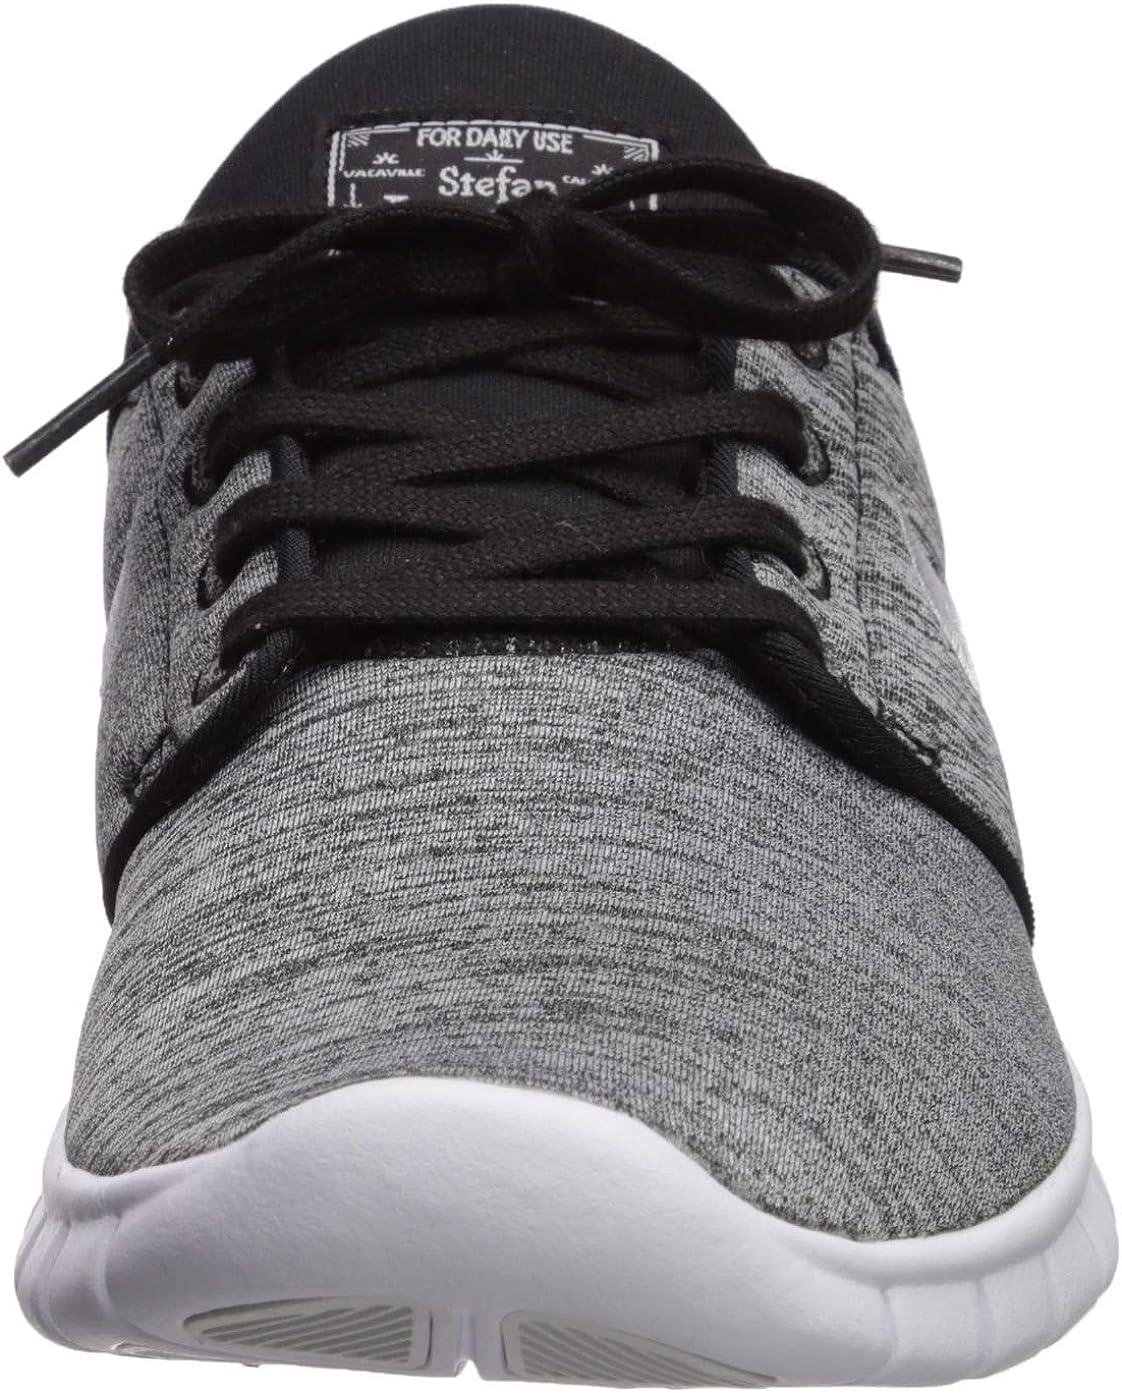 Nike Herren Stefan Janoski Max Turnschuhe Schwarz Black White 028